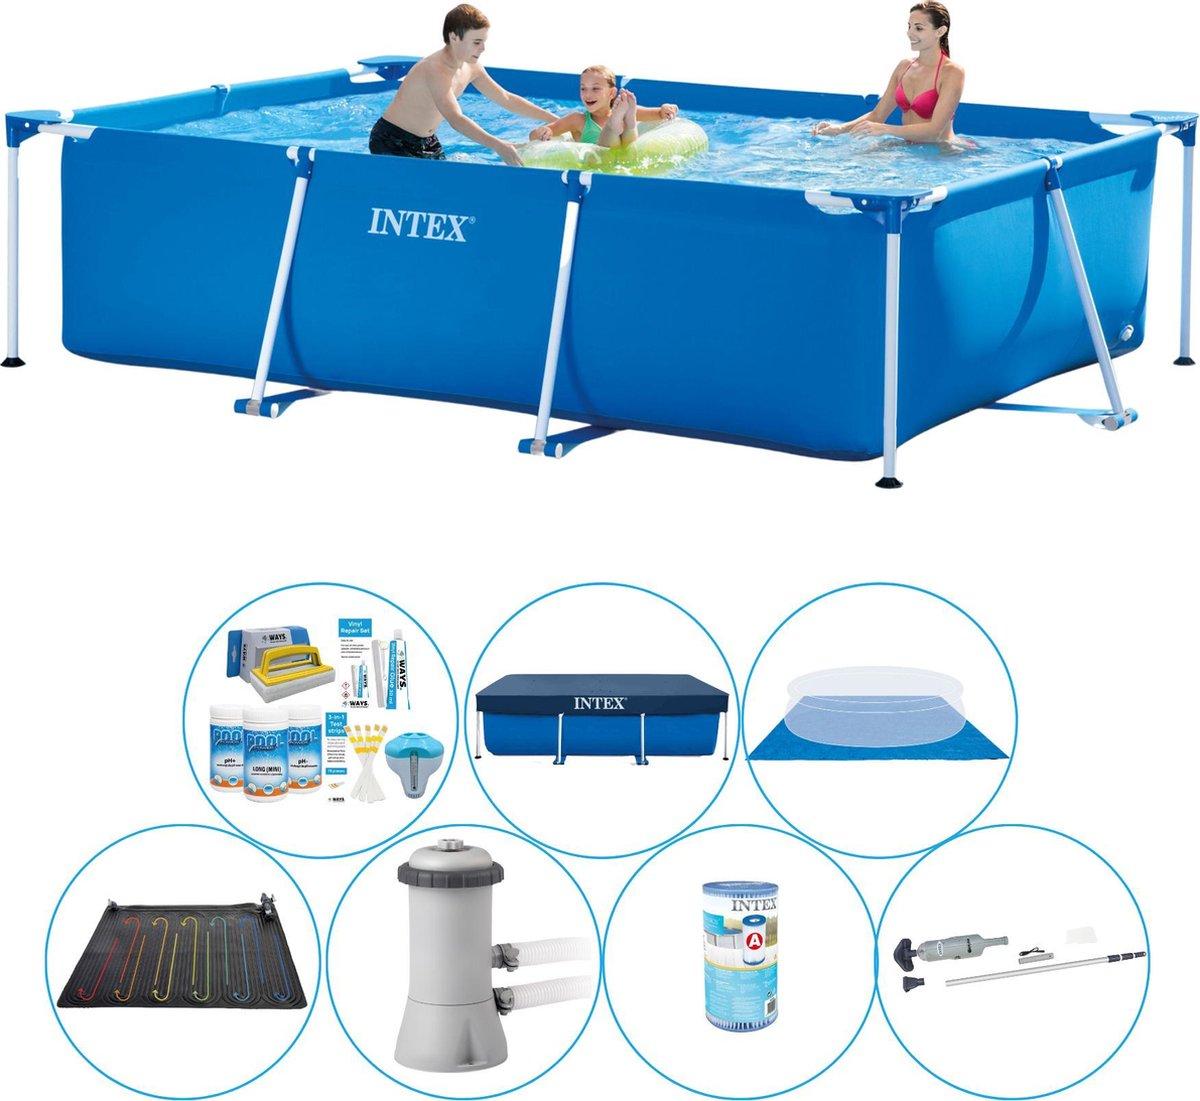 Intex Frame Pool Zwembad - 300 x 200 x 75 cm - Totaal pakket